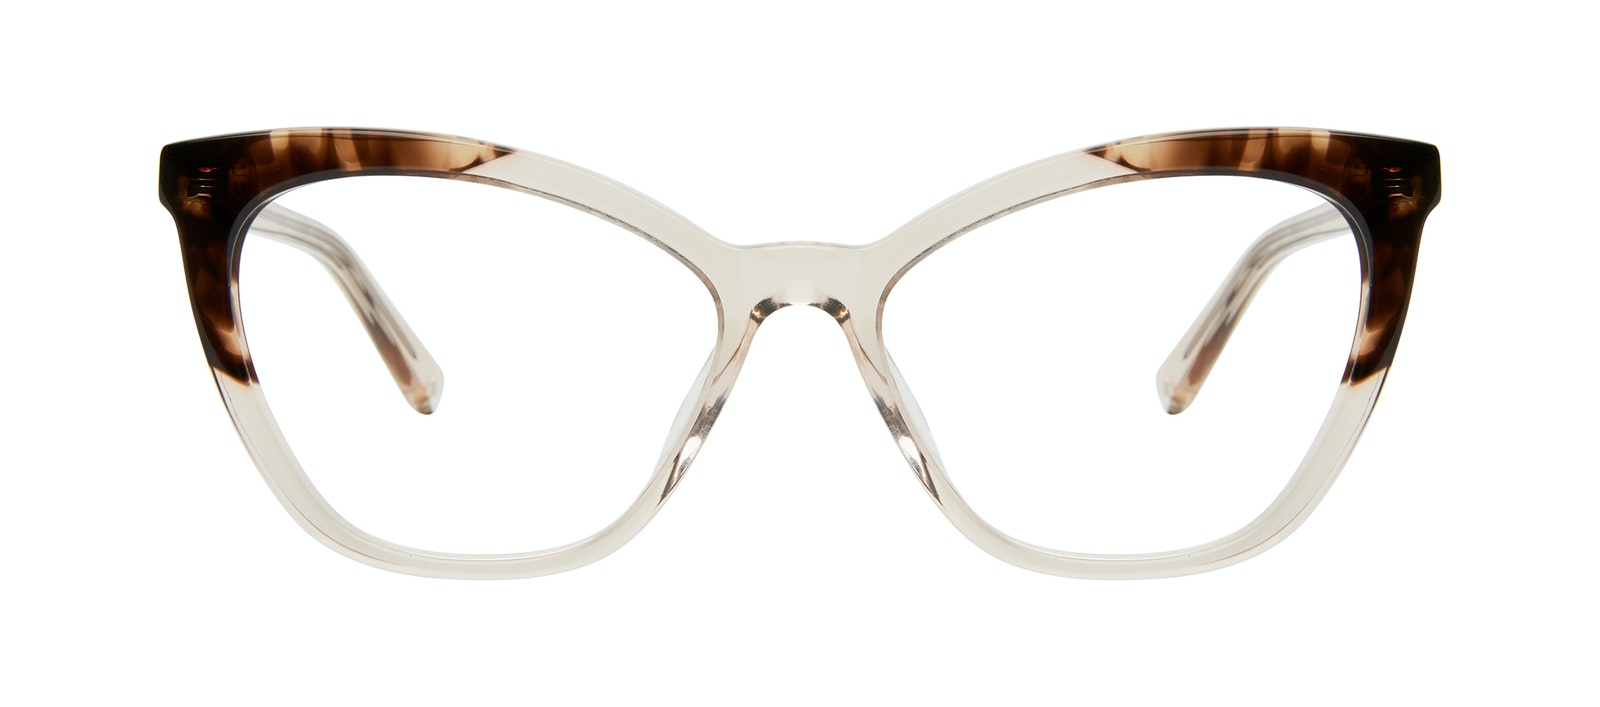 Affordable Fashion Glasses Cat Eye Eyeglasses Women Elan Golden Tortoise Front